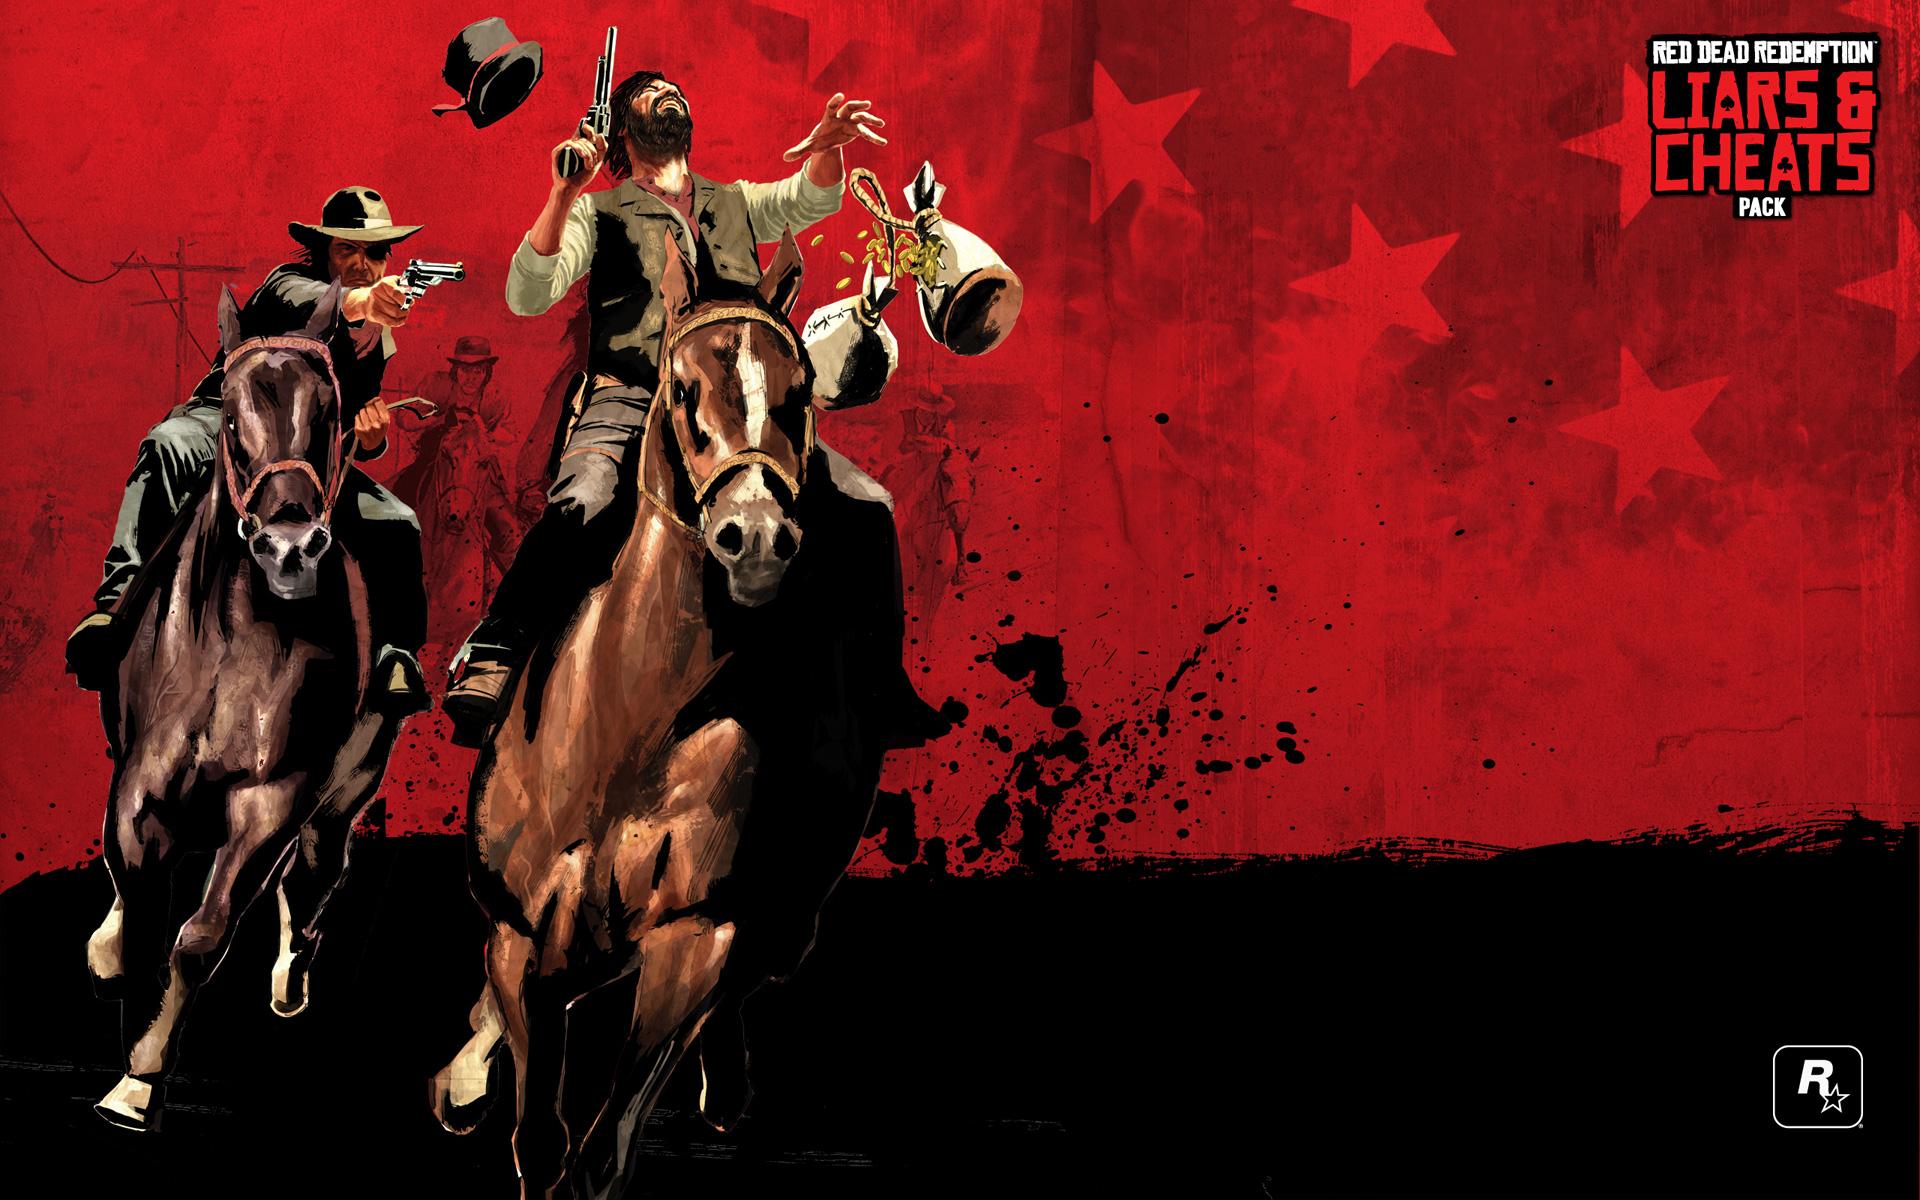 Free Red Dead Redemption Wallpaper in 1920x1200